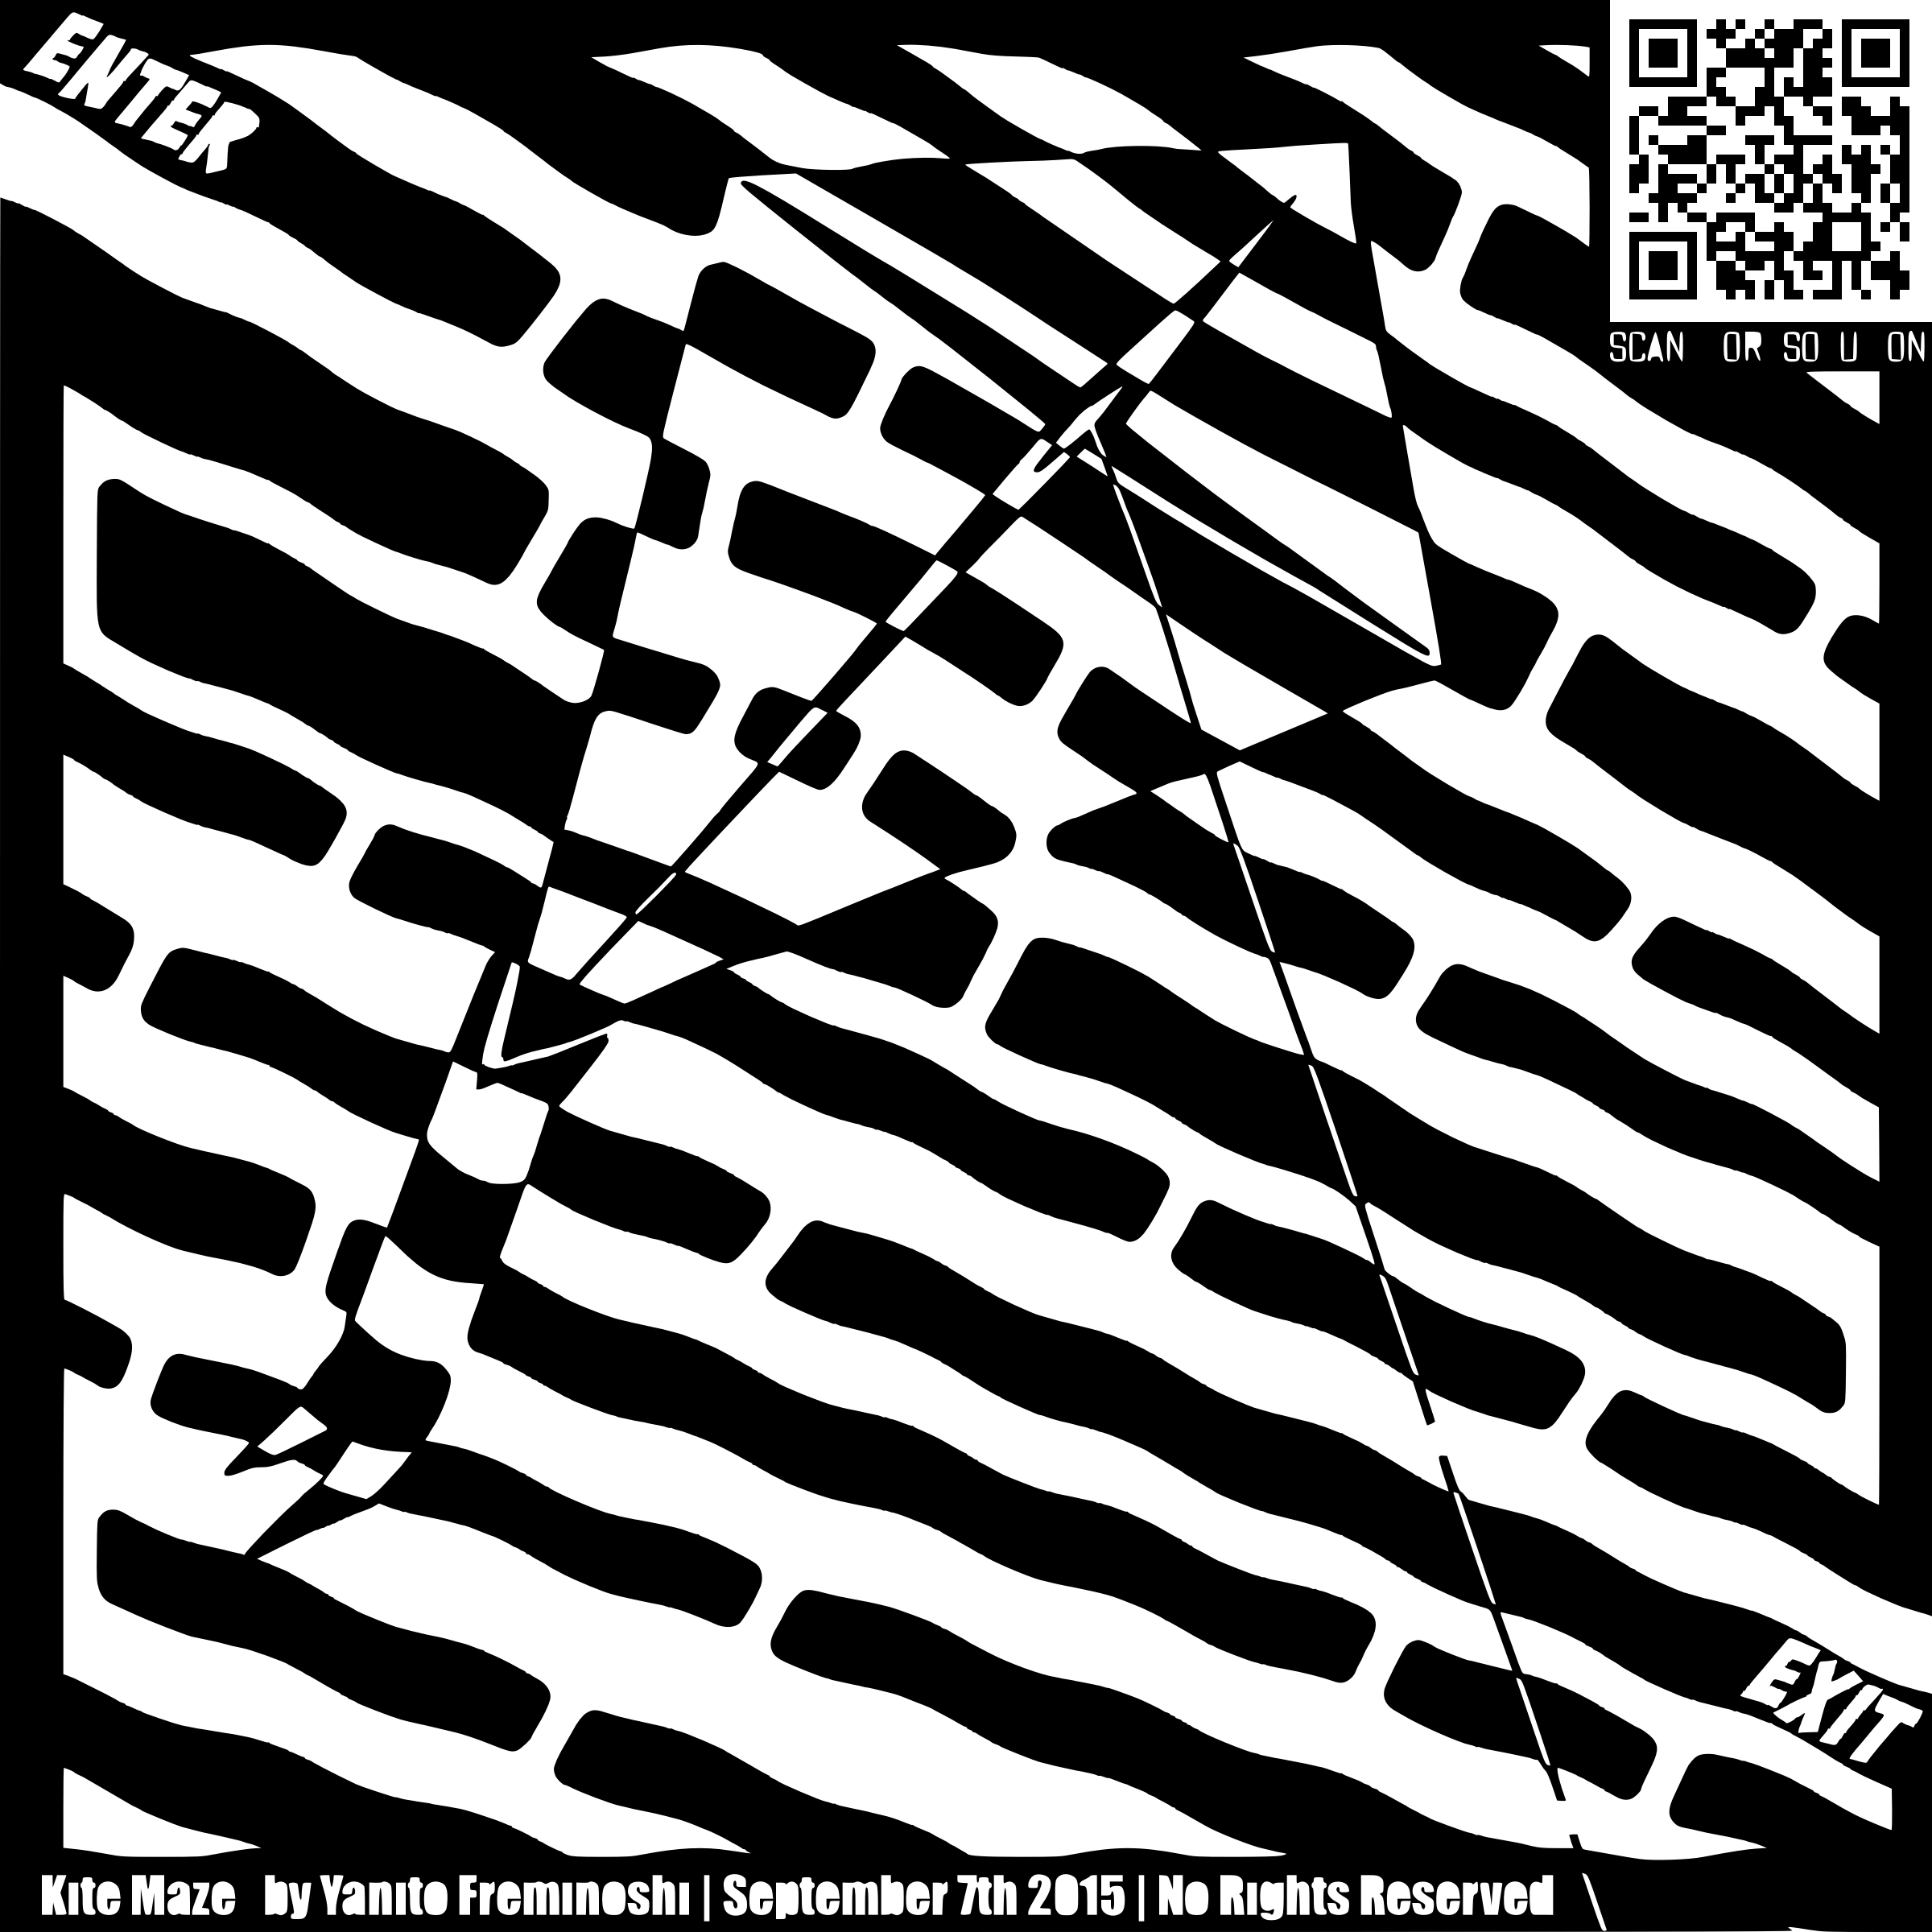 Kite kite design